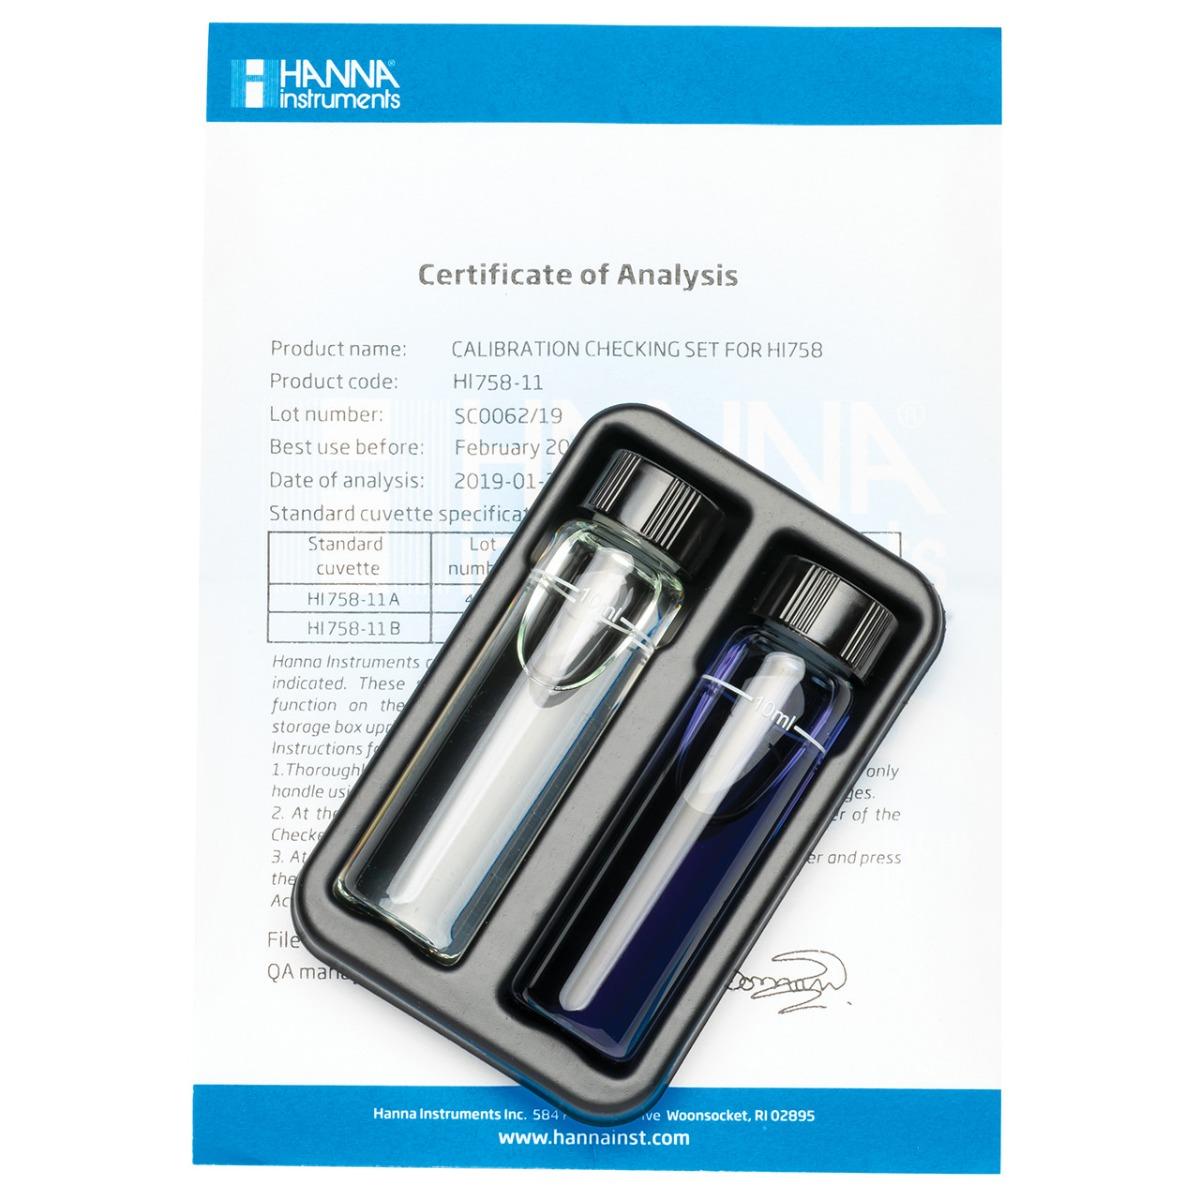 HI758-11 Marine Calcium Checker Calibration Set